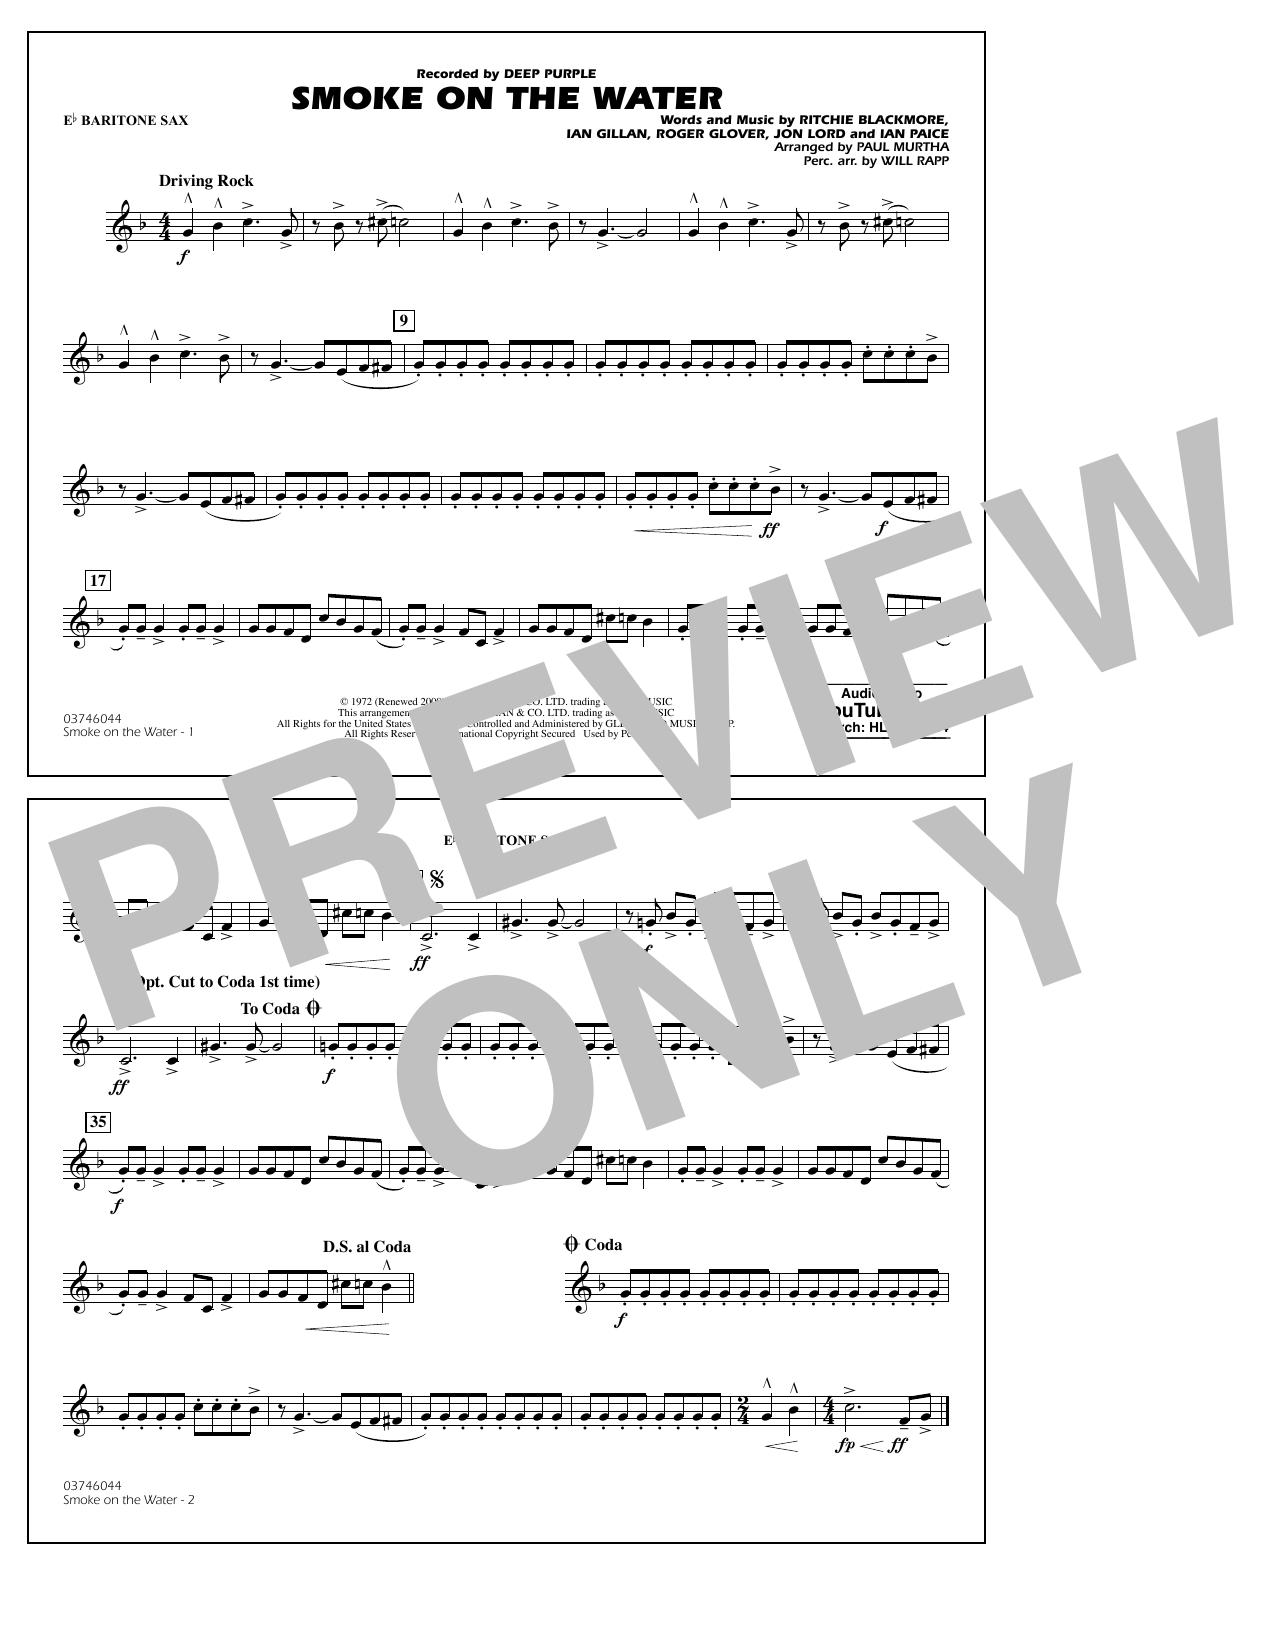 Paul Murtha Smoke on the Water - Eb Baritone Sax sheet music notes and chords. Download Printable PDF.